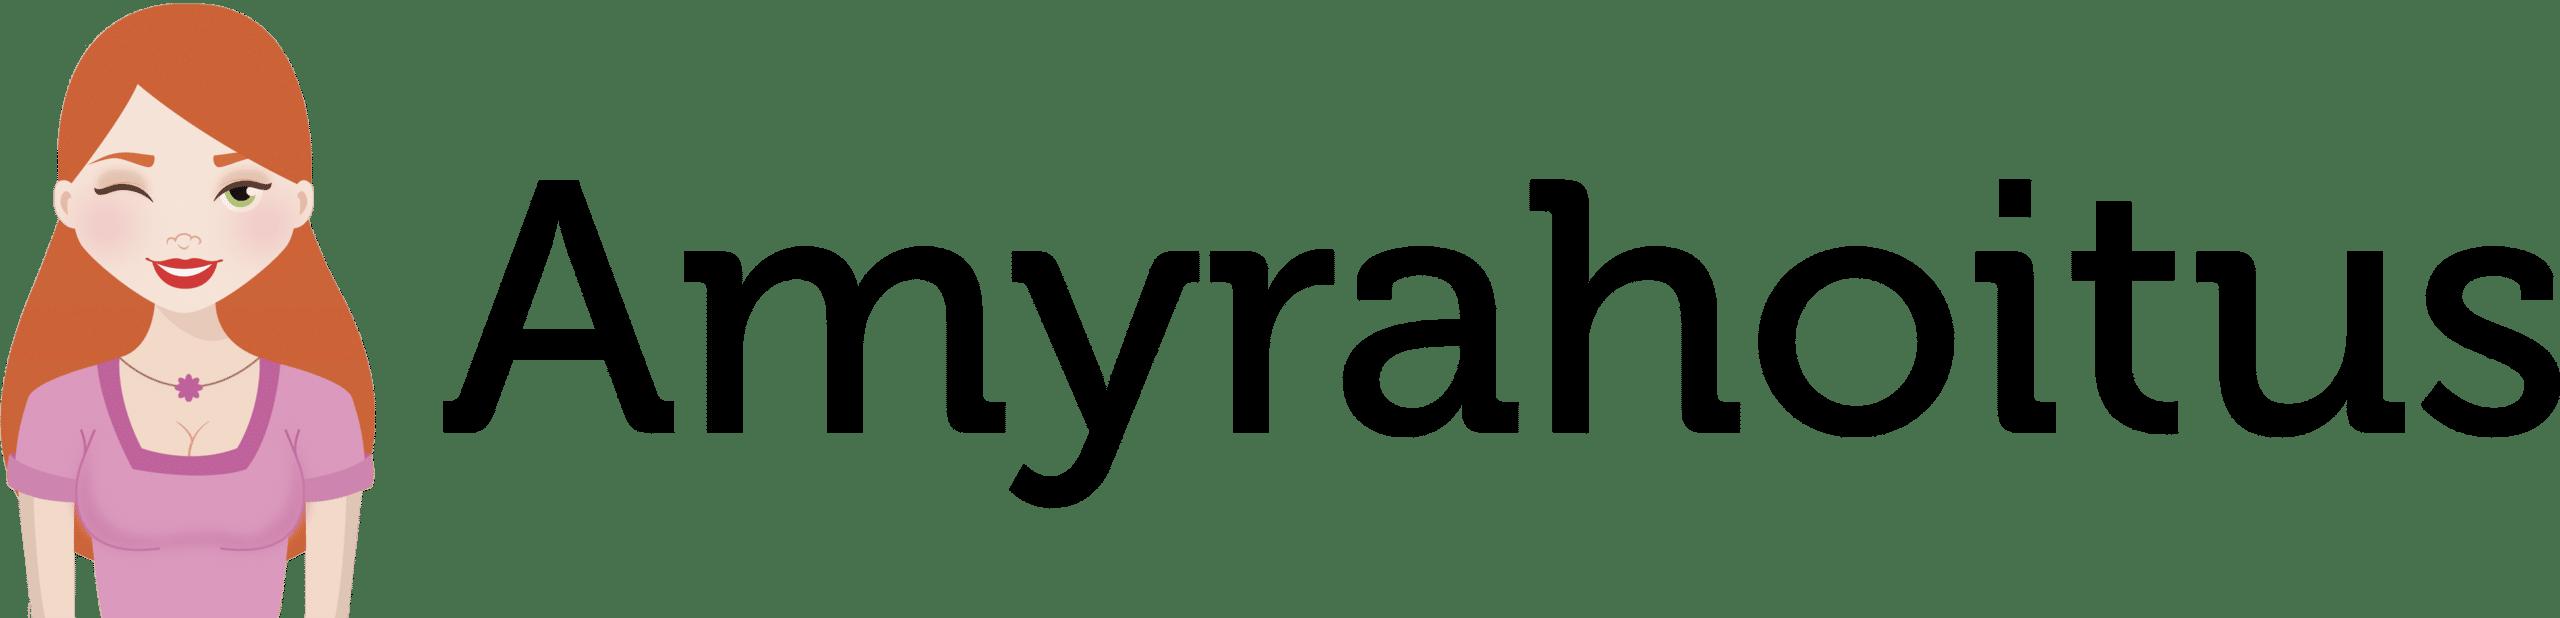 Amyrahoitus